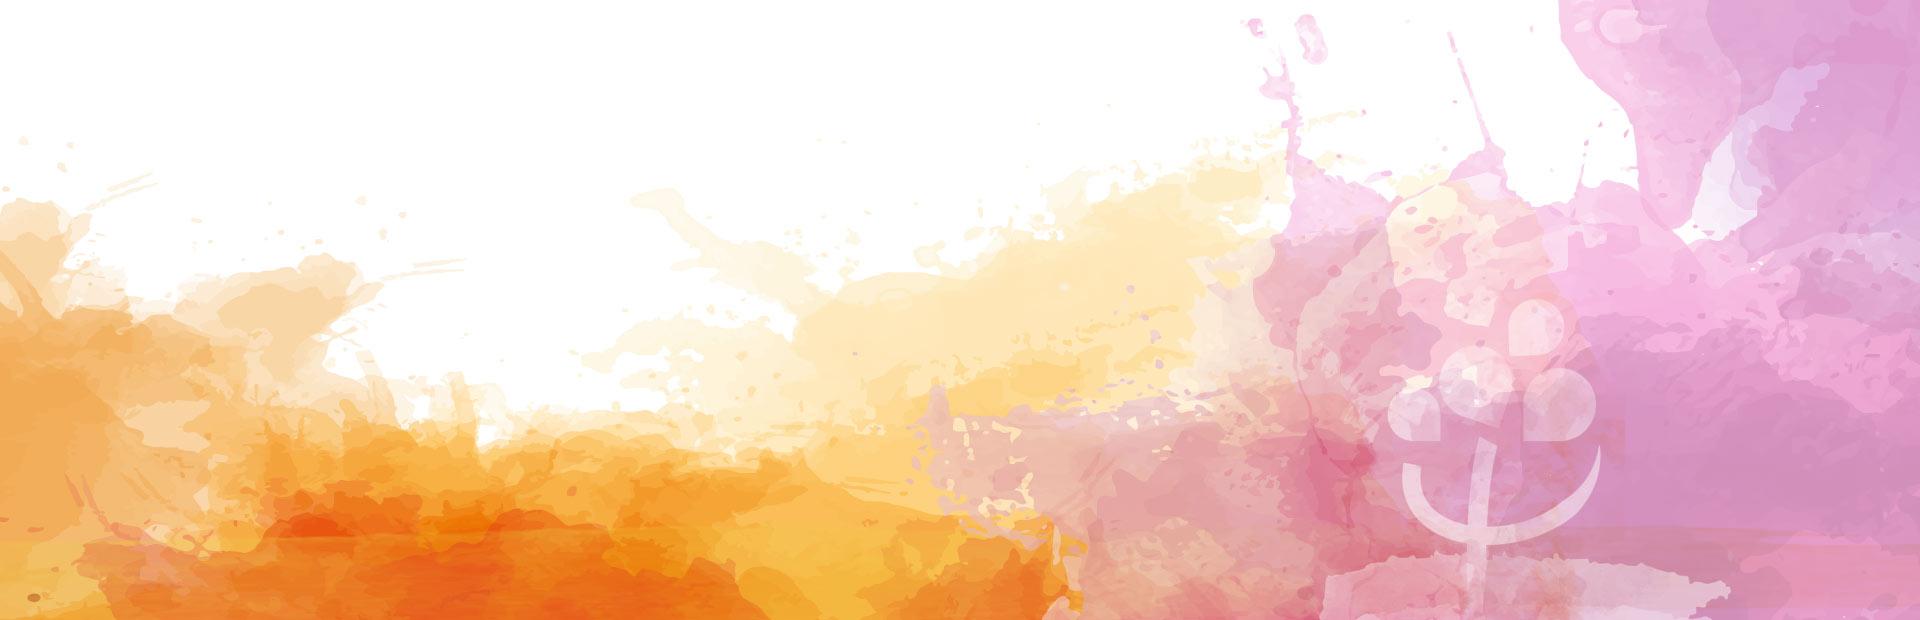 slide-watercolor-3